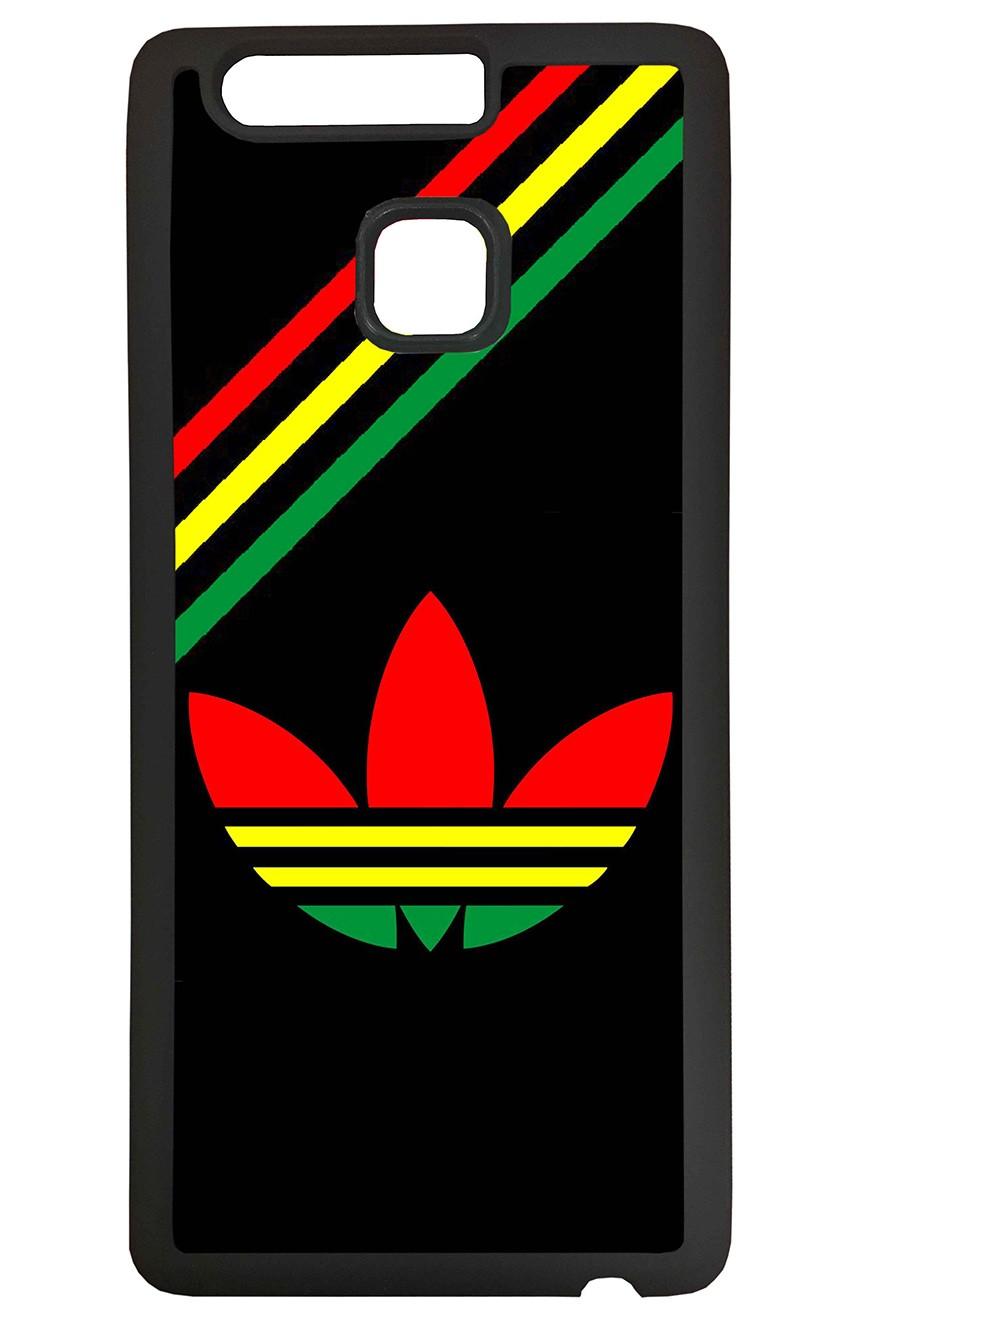 a7b71b03dde Funda carcasas móvil adidas africa compatible con el móvil Huawei P9